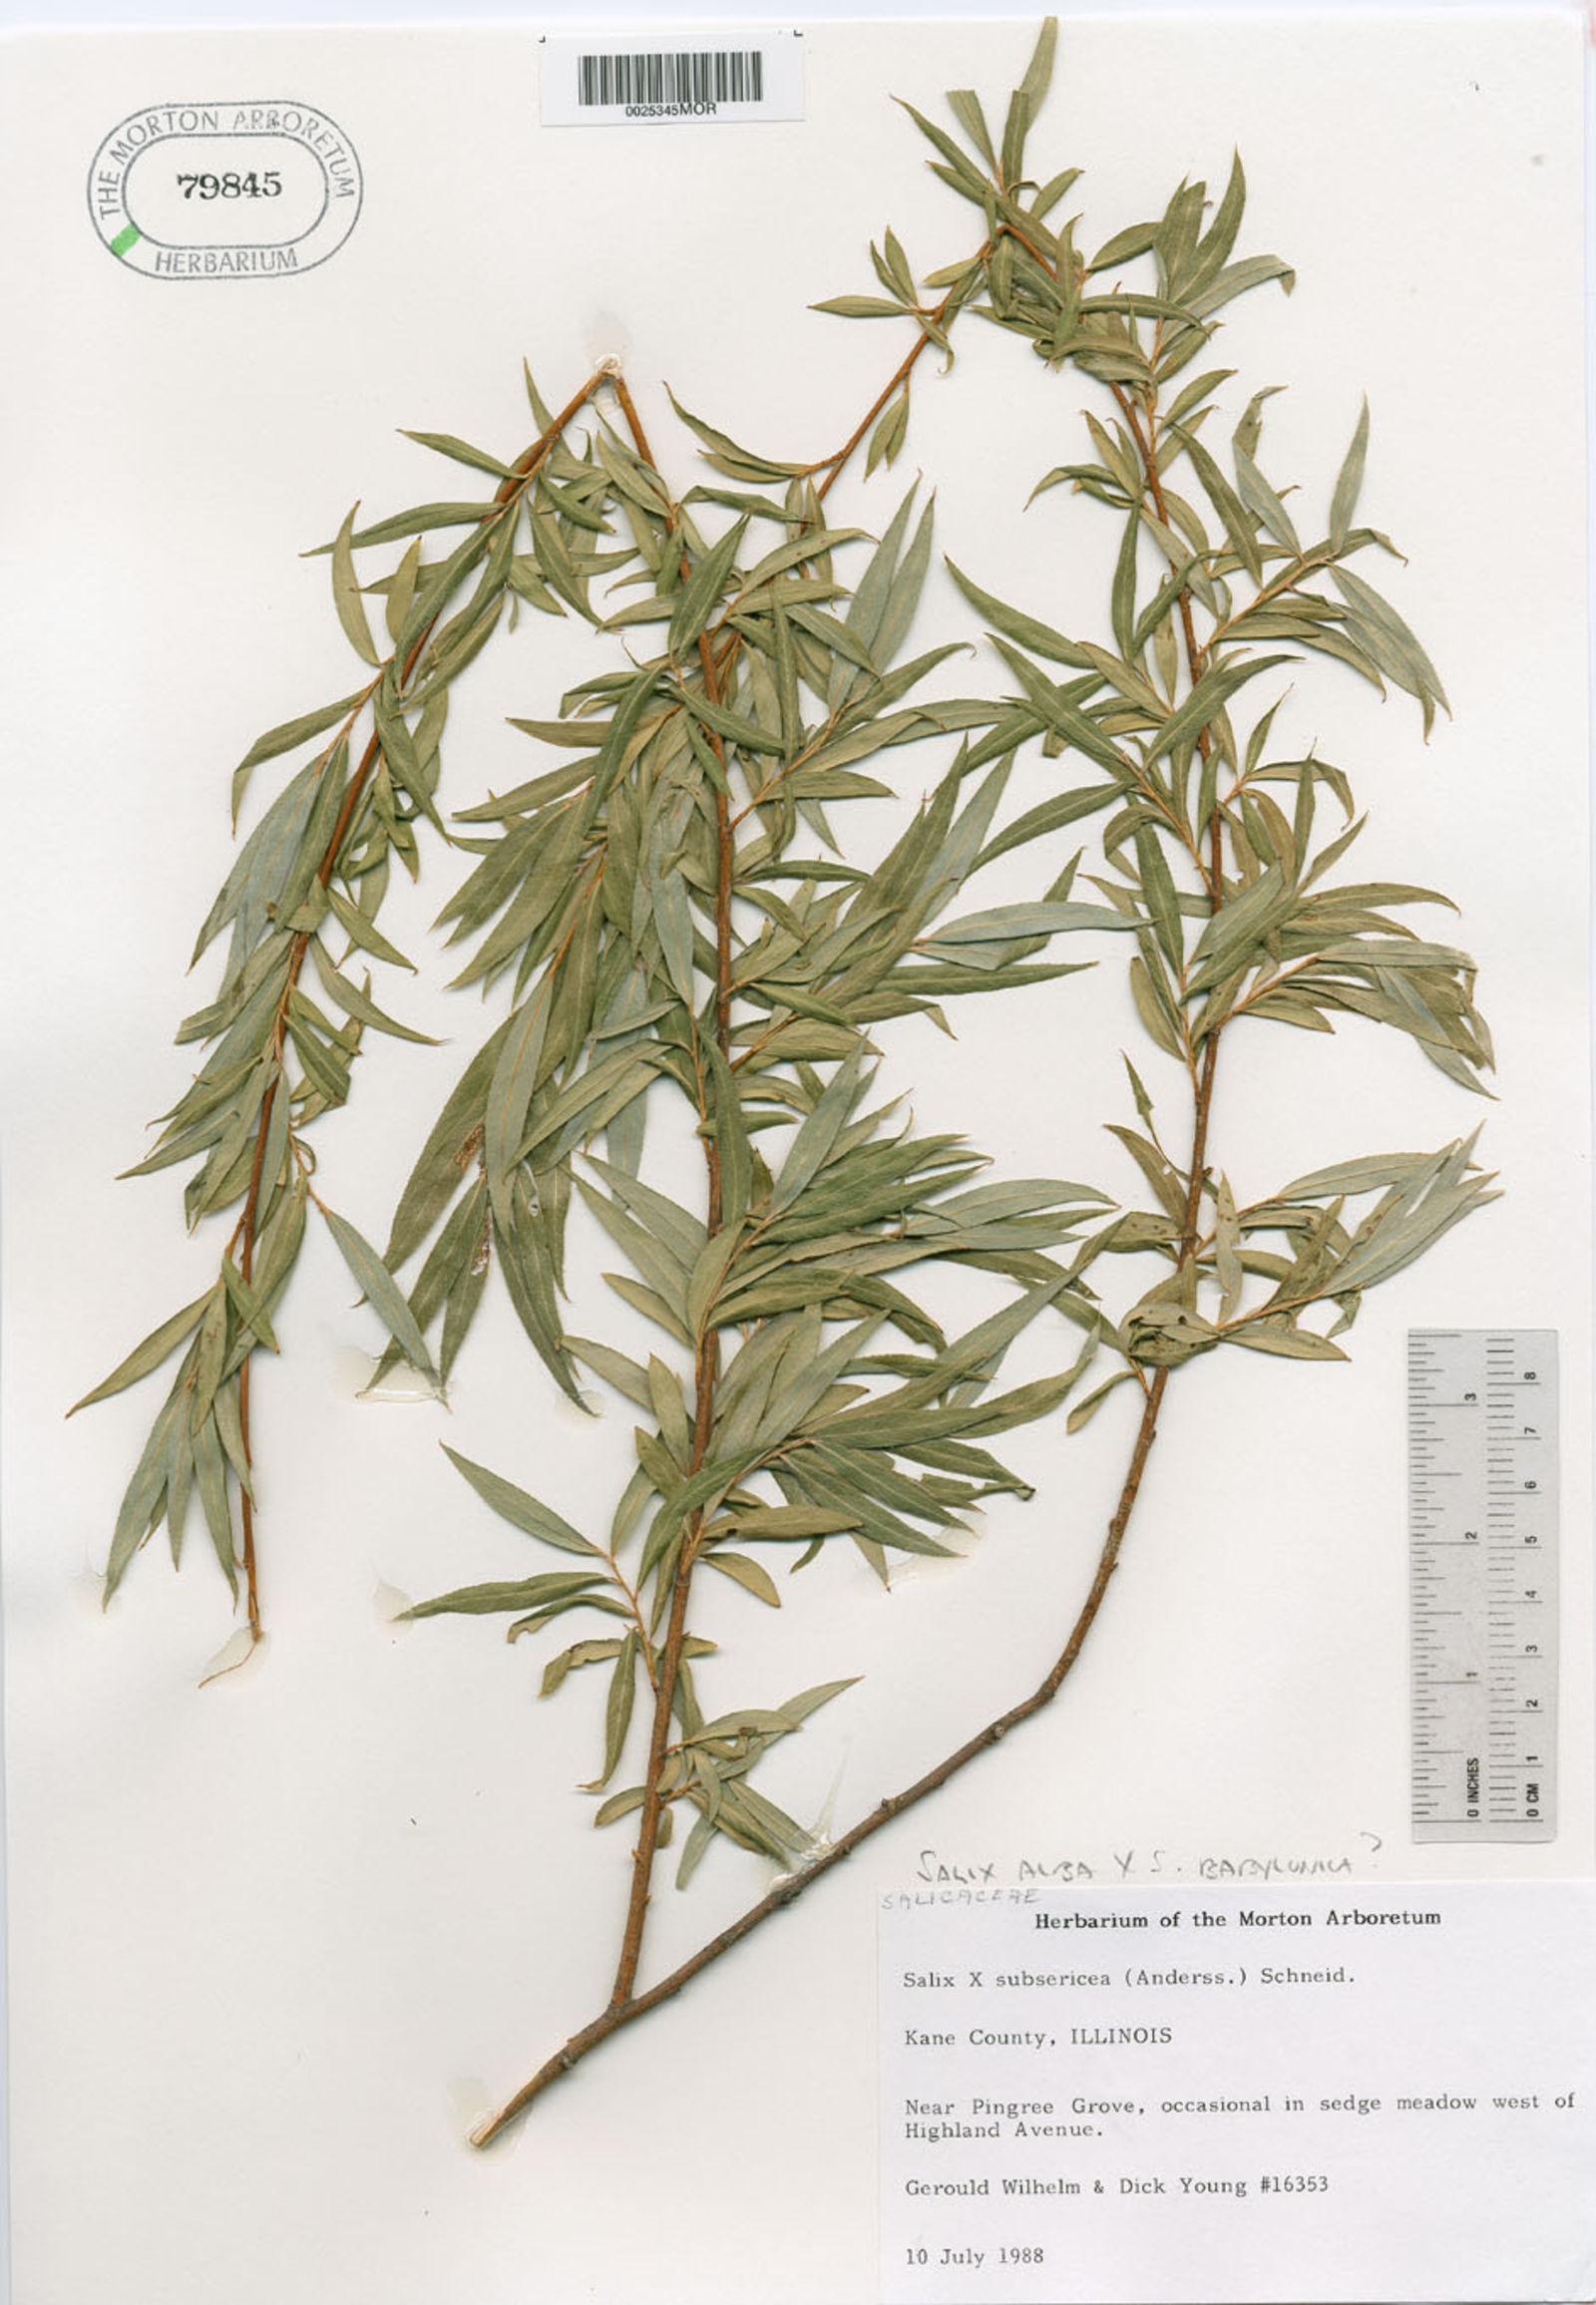 Salix x subsericea image